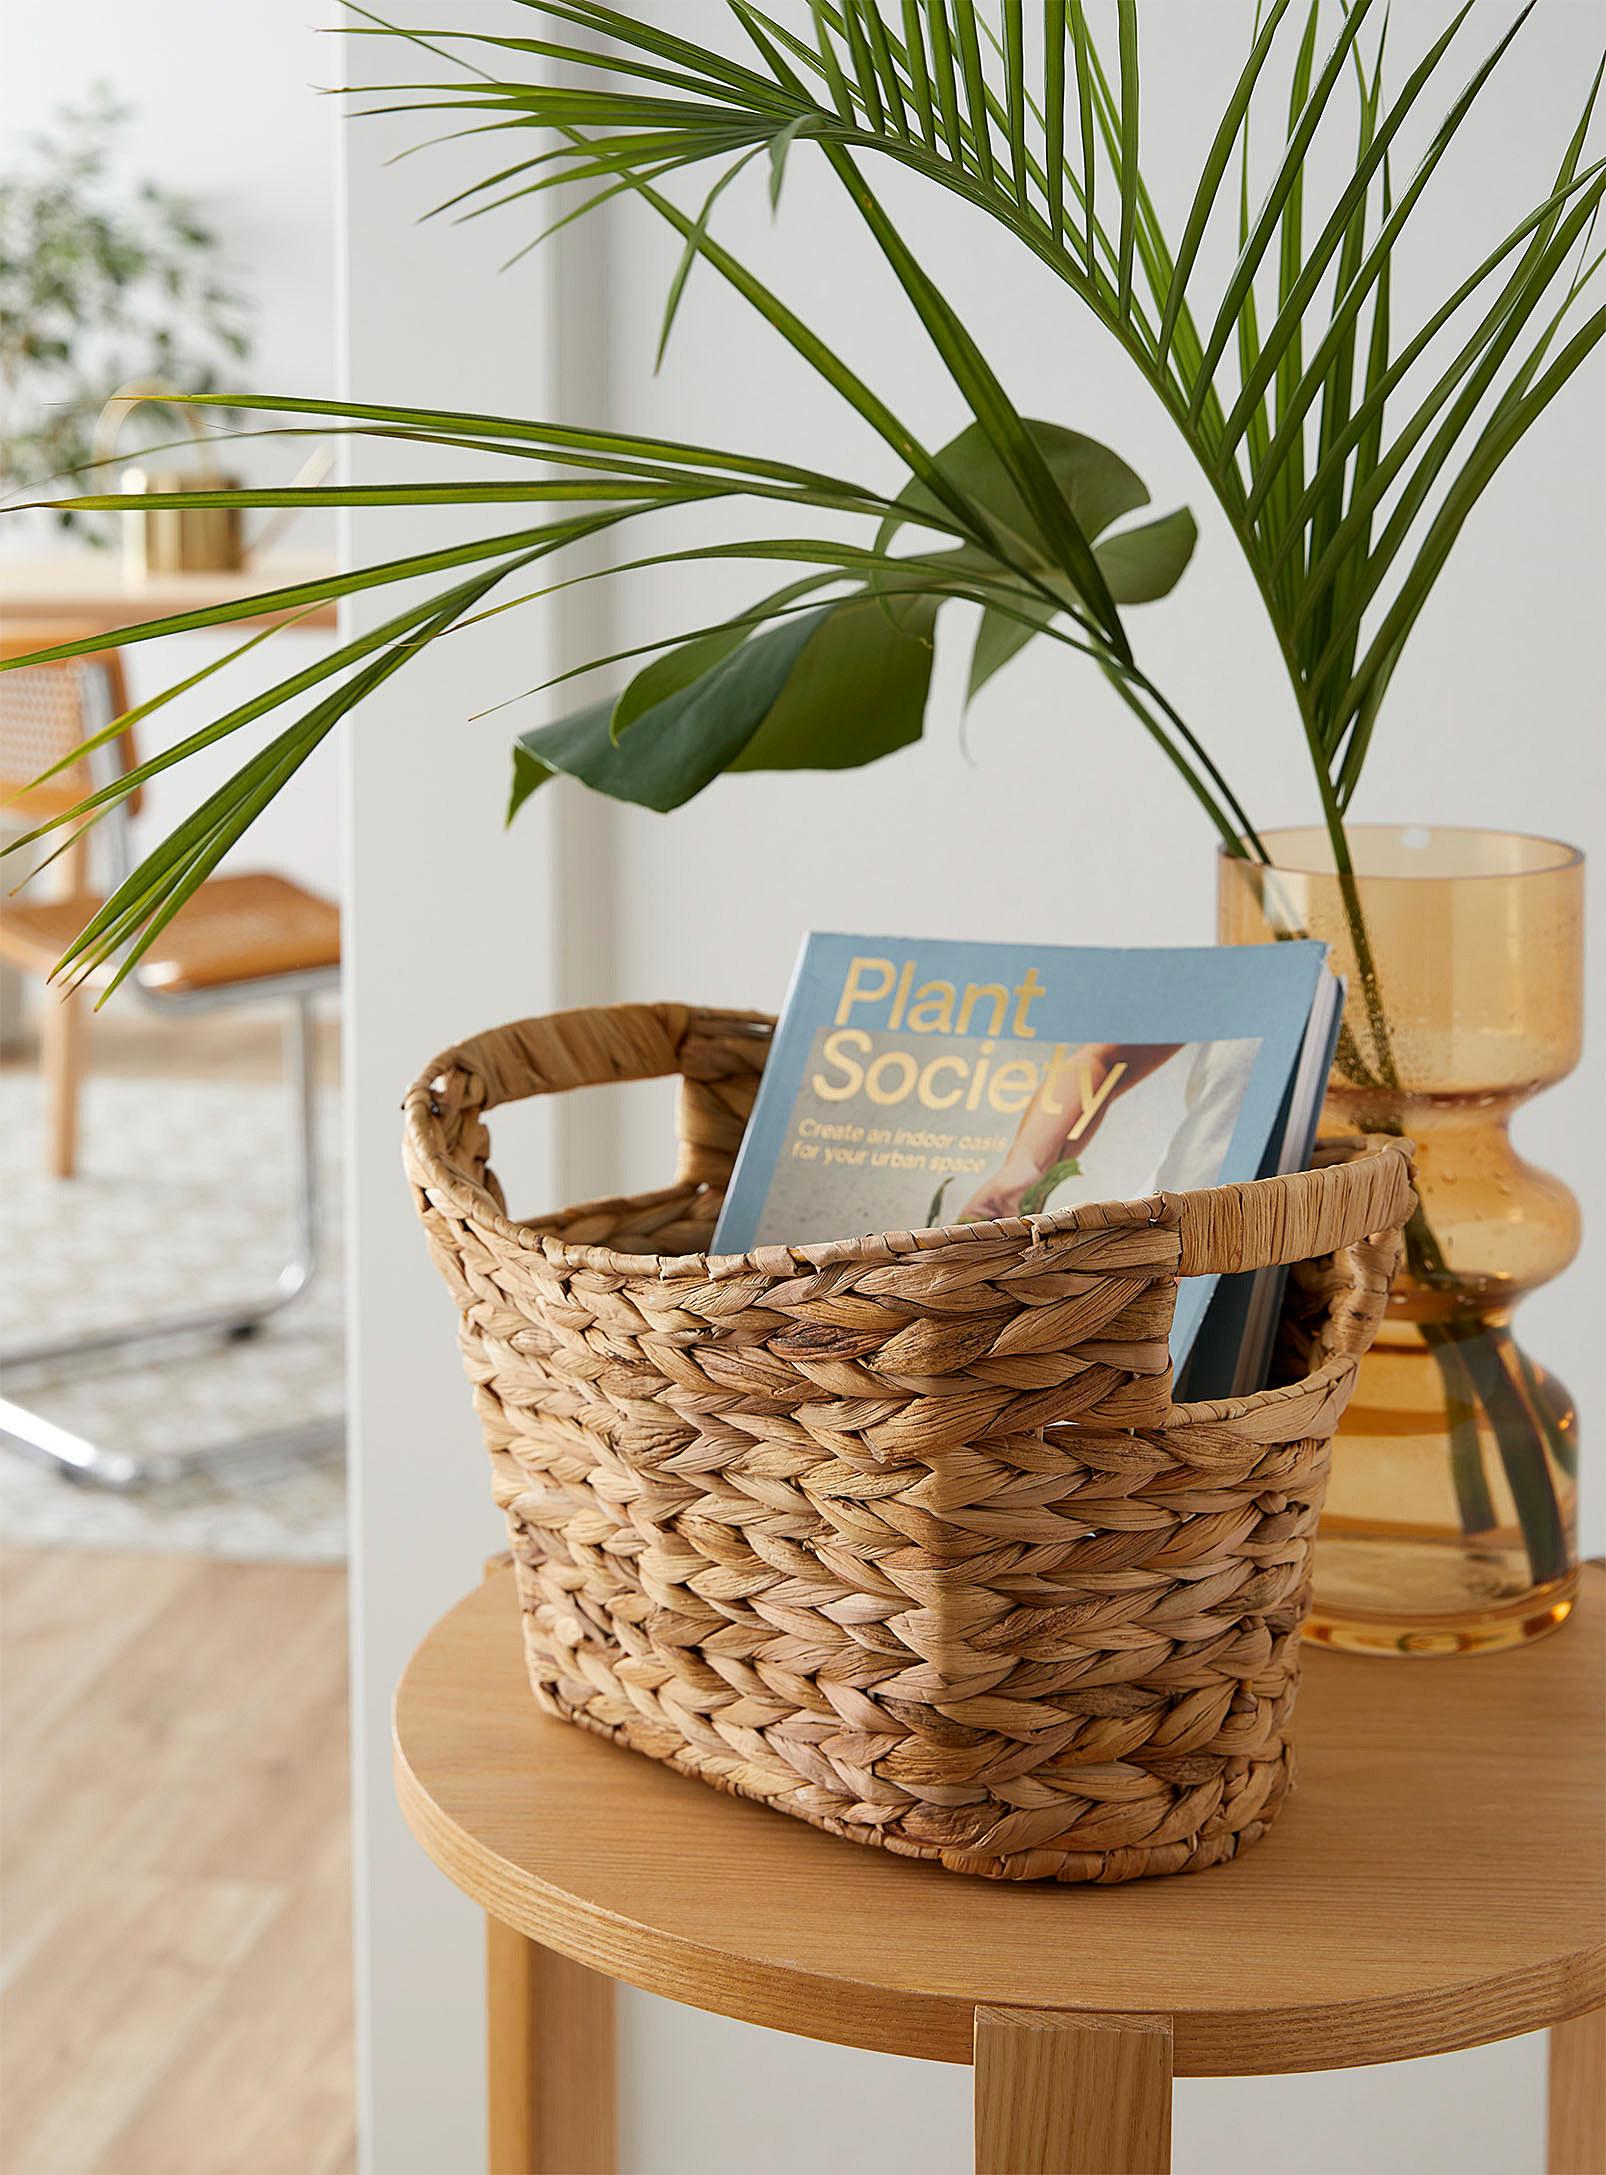 A hand-woven hyacinth magazine basket on a side table